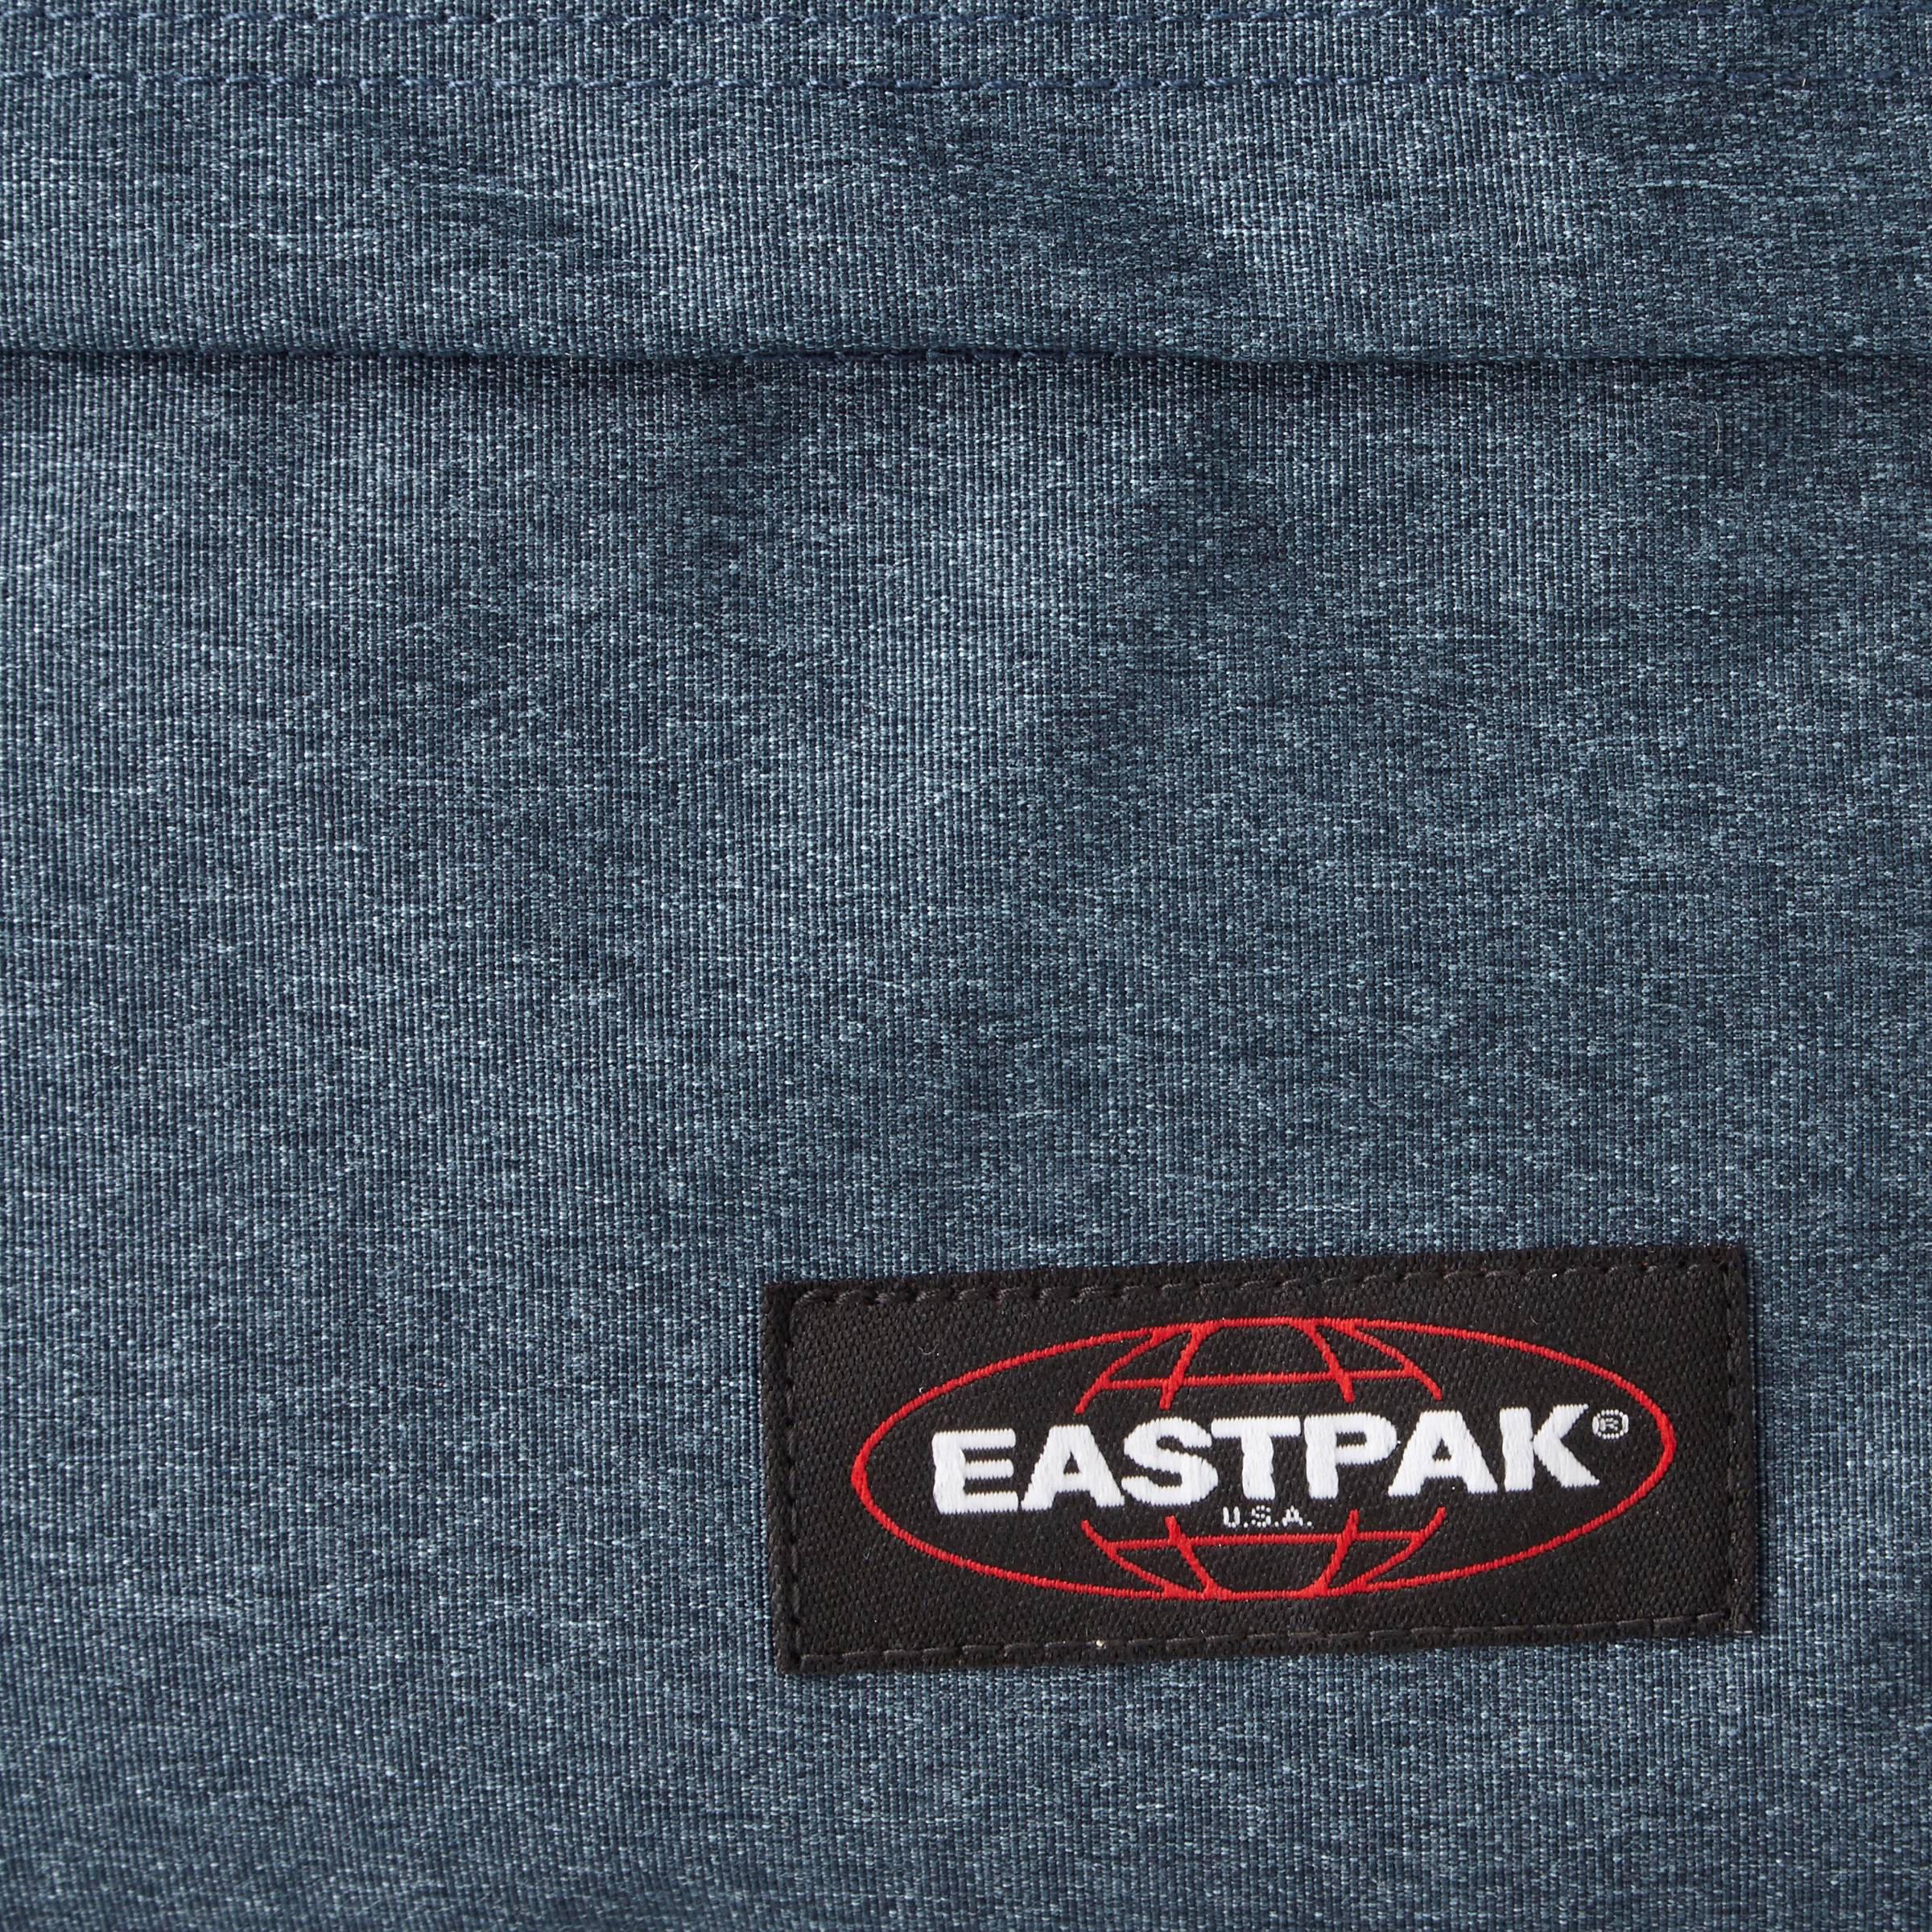 9fd32c30974 Eastpak Padded Pak'r rugzak double denim | wehkamp